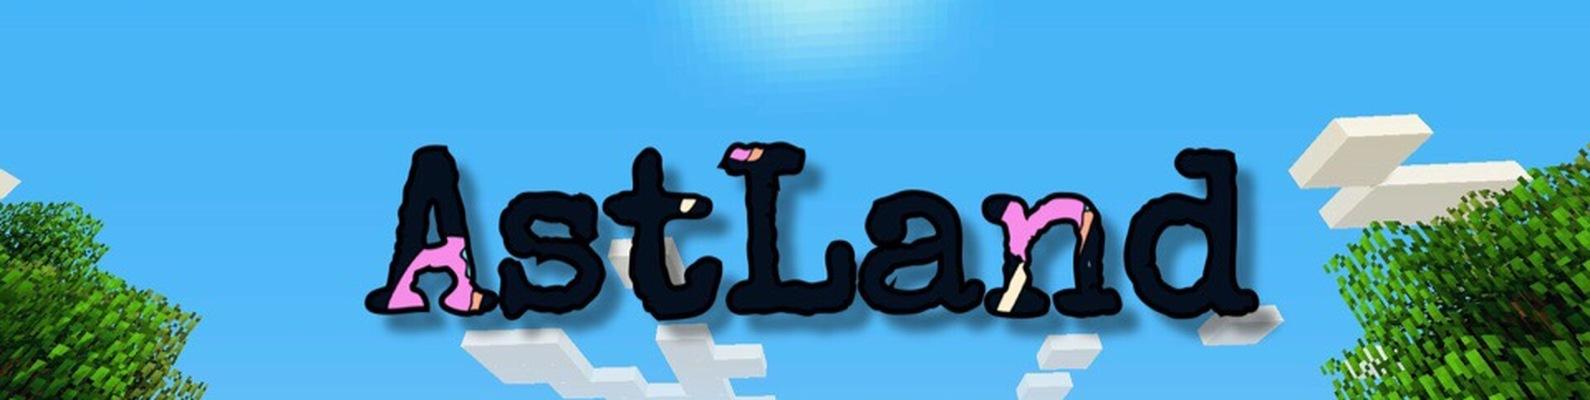 AstLand | ASTLAND1.aternos.me [CLOSED{ | VK